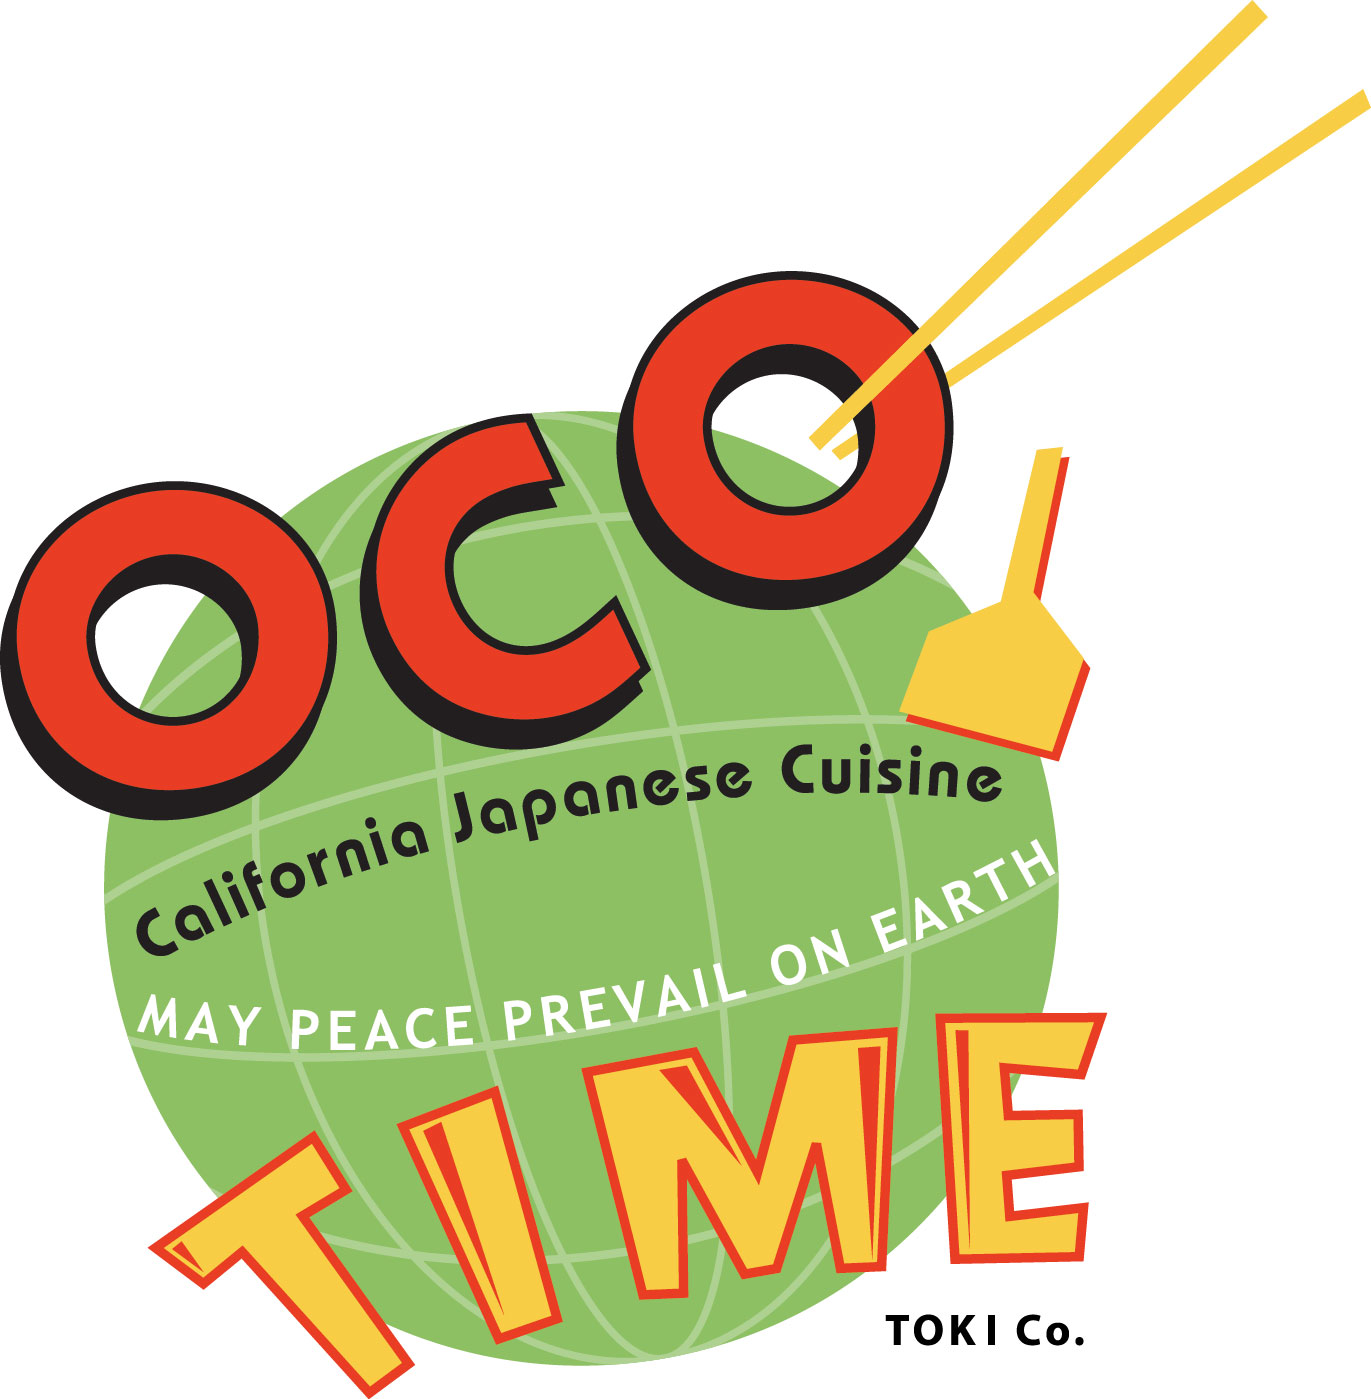 OCO_TIME_TOKI.jpg